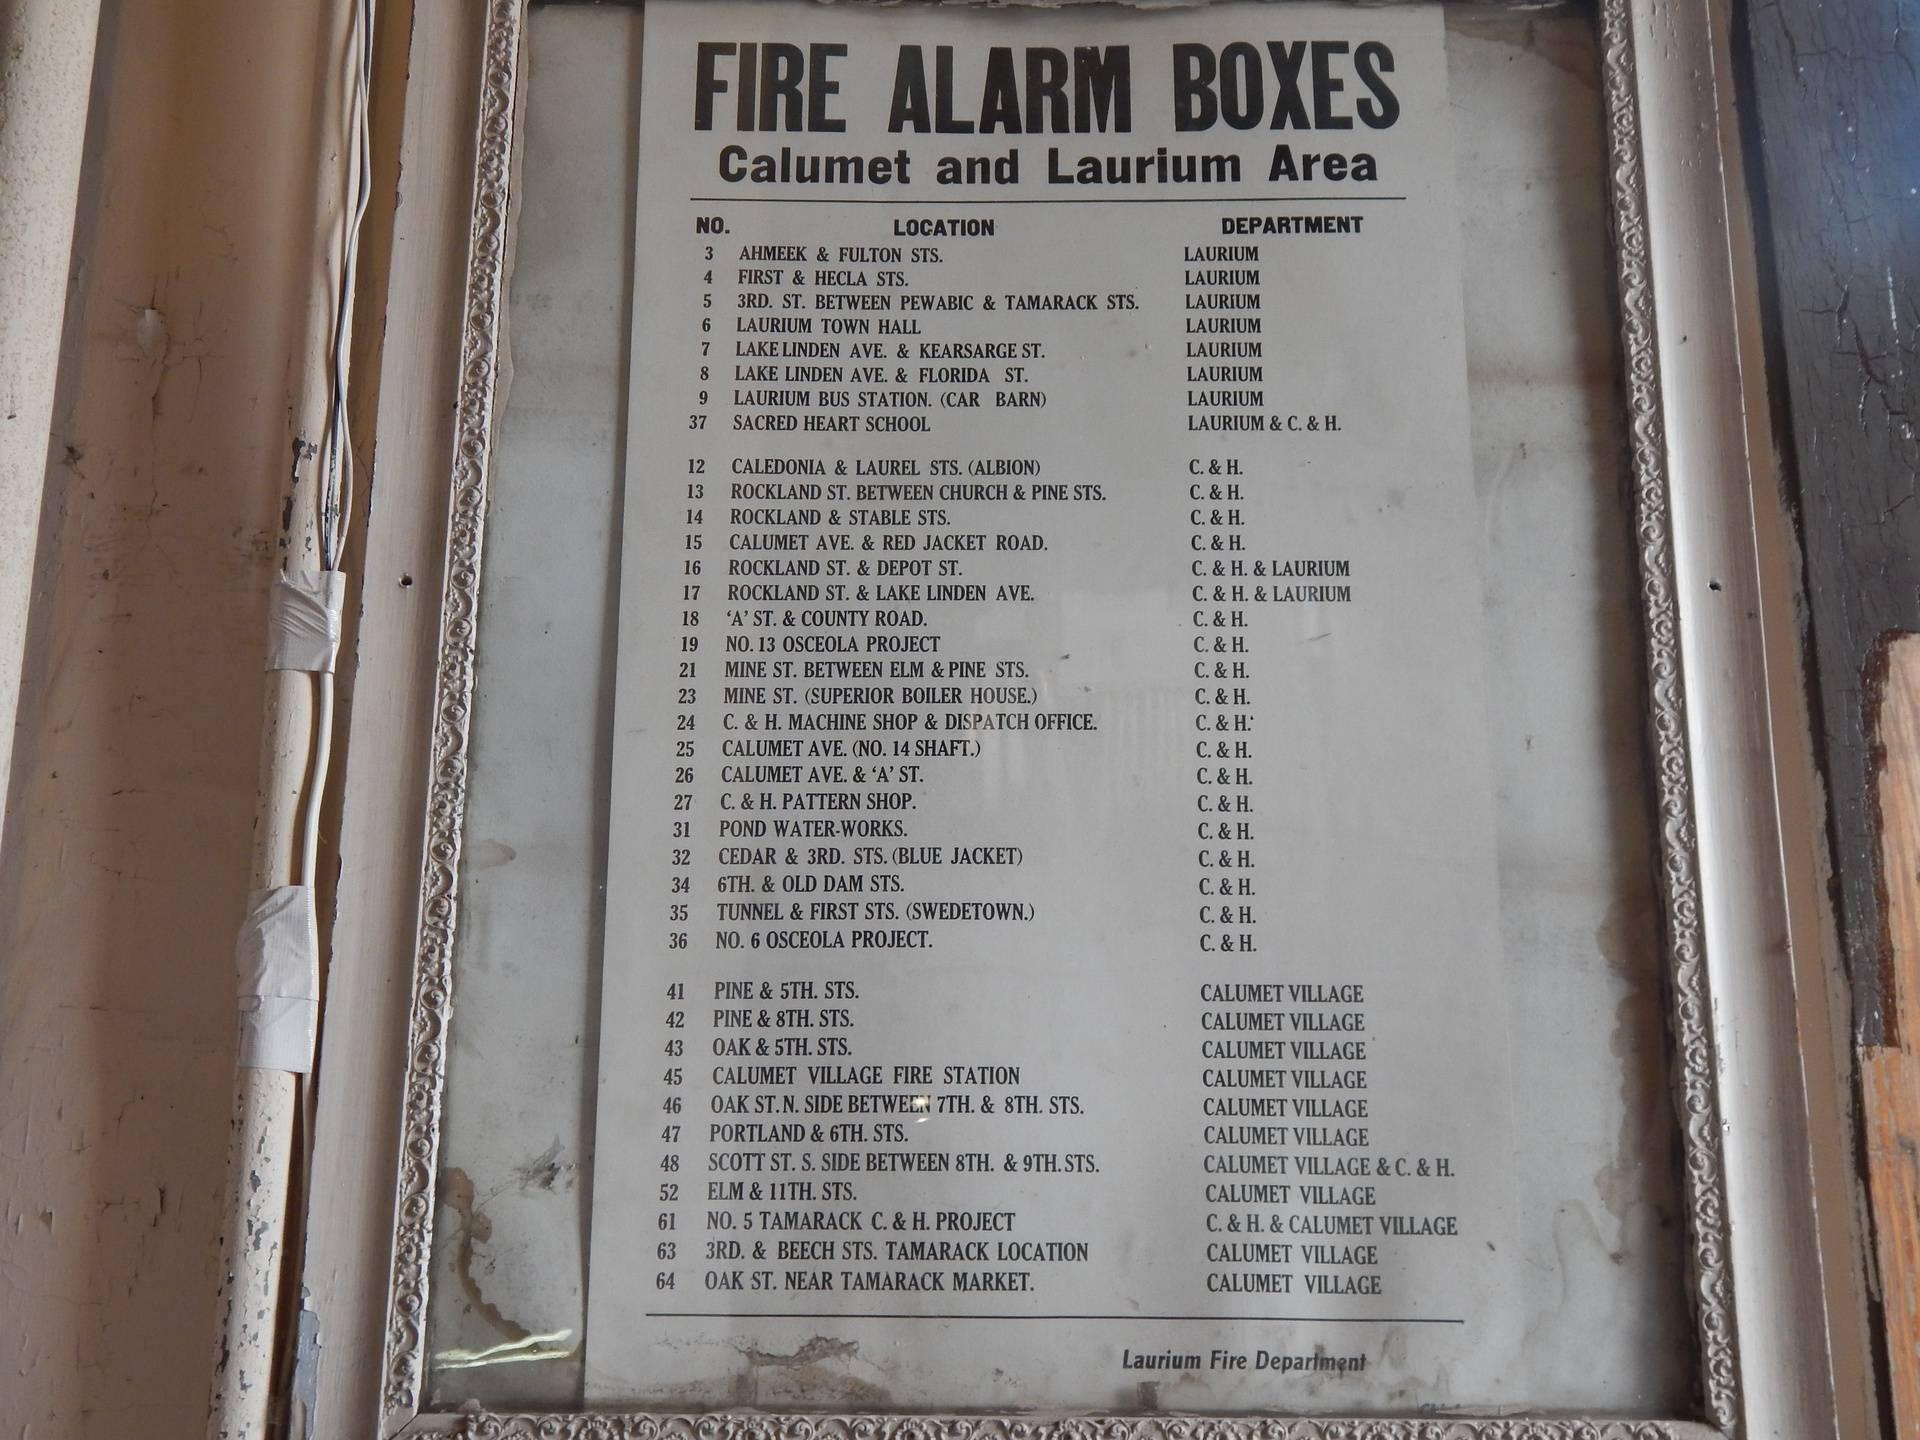 Calumet area Fire Alarm Box locations